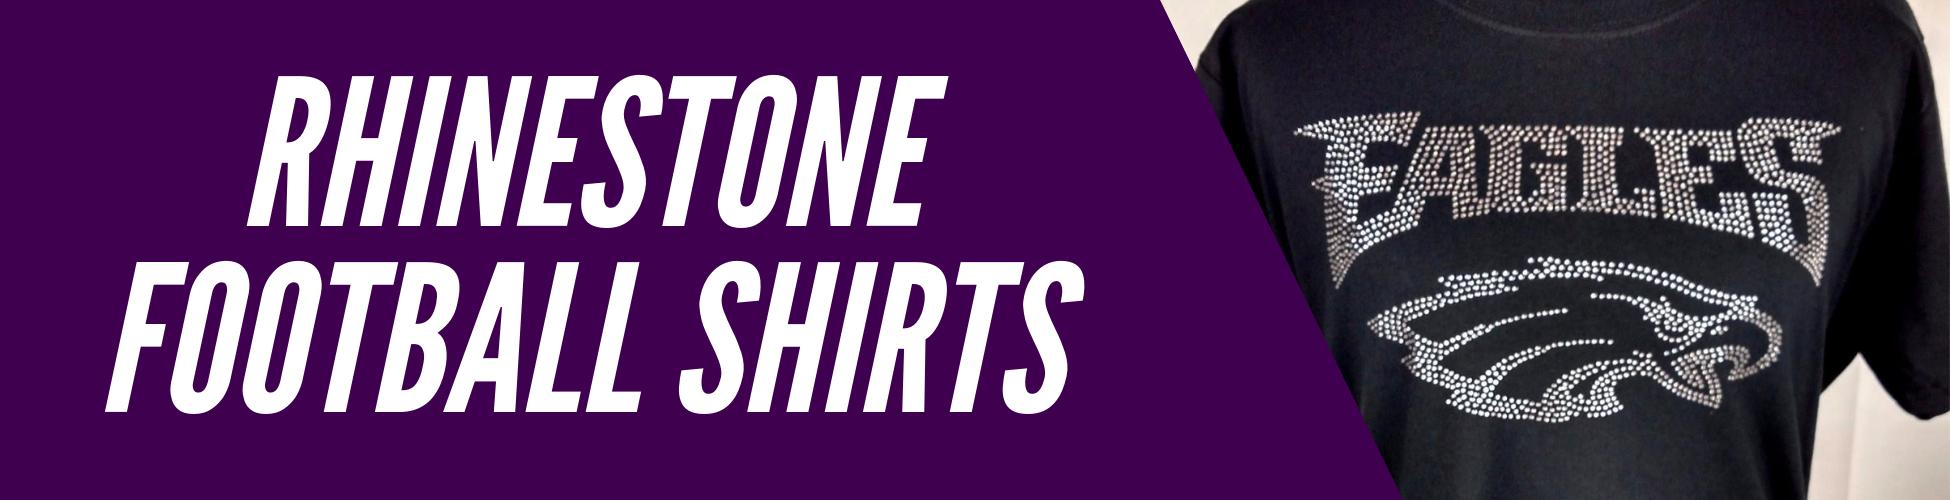 rhinestone-football-shirts-banner-v3.png